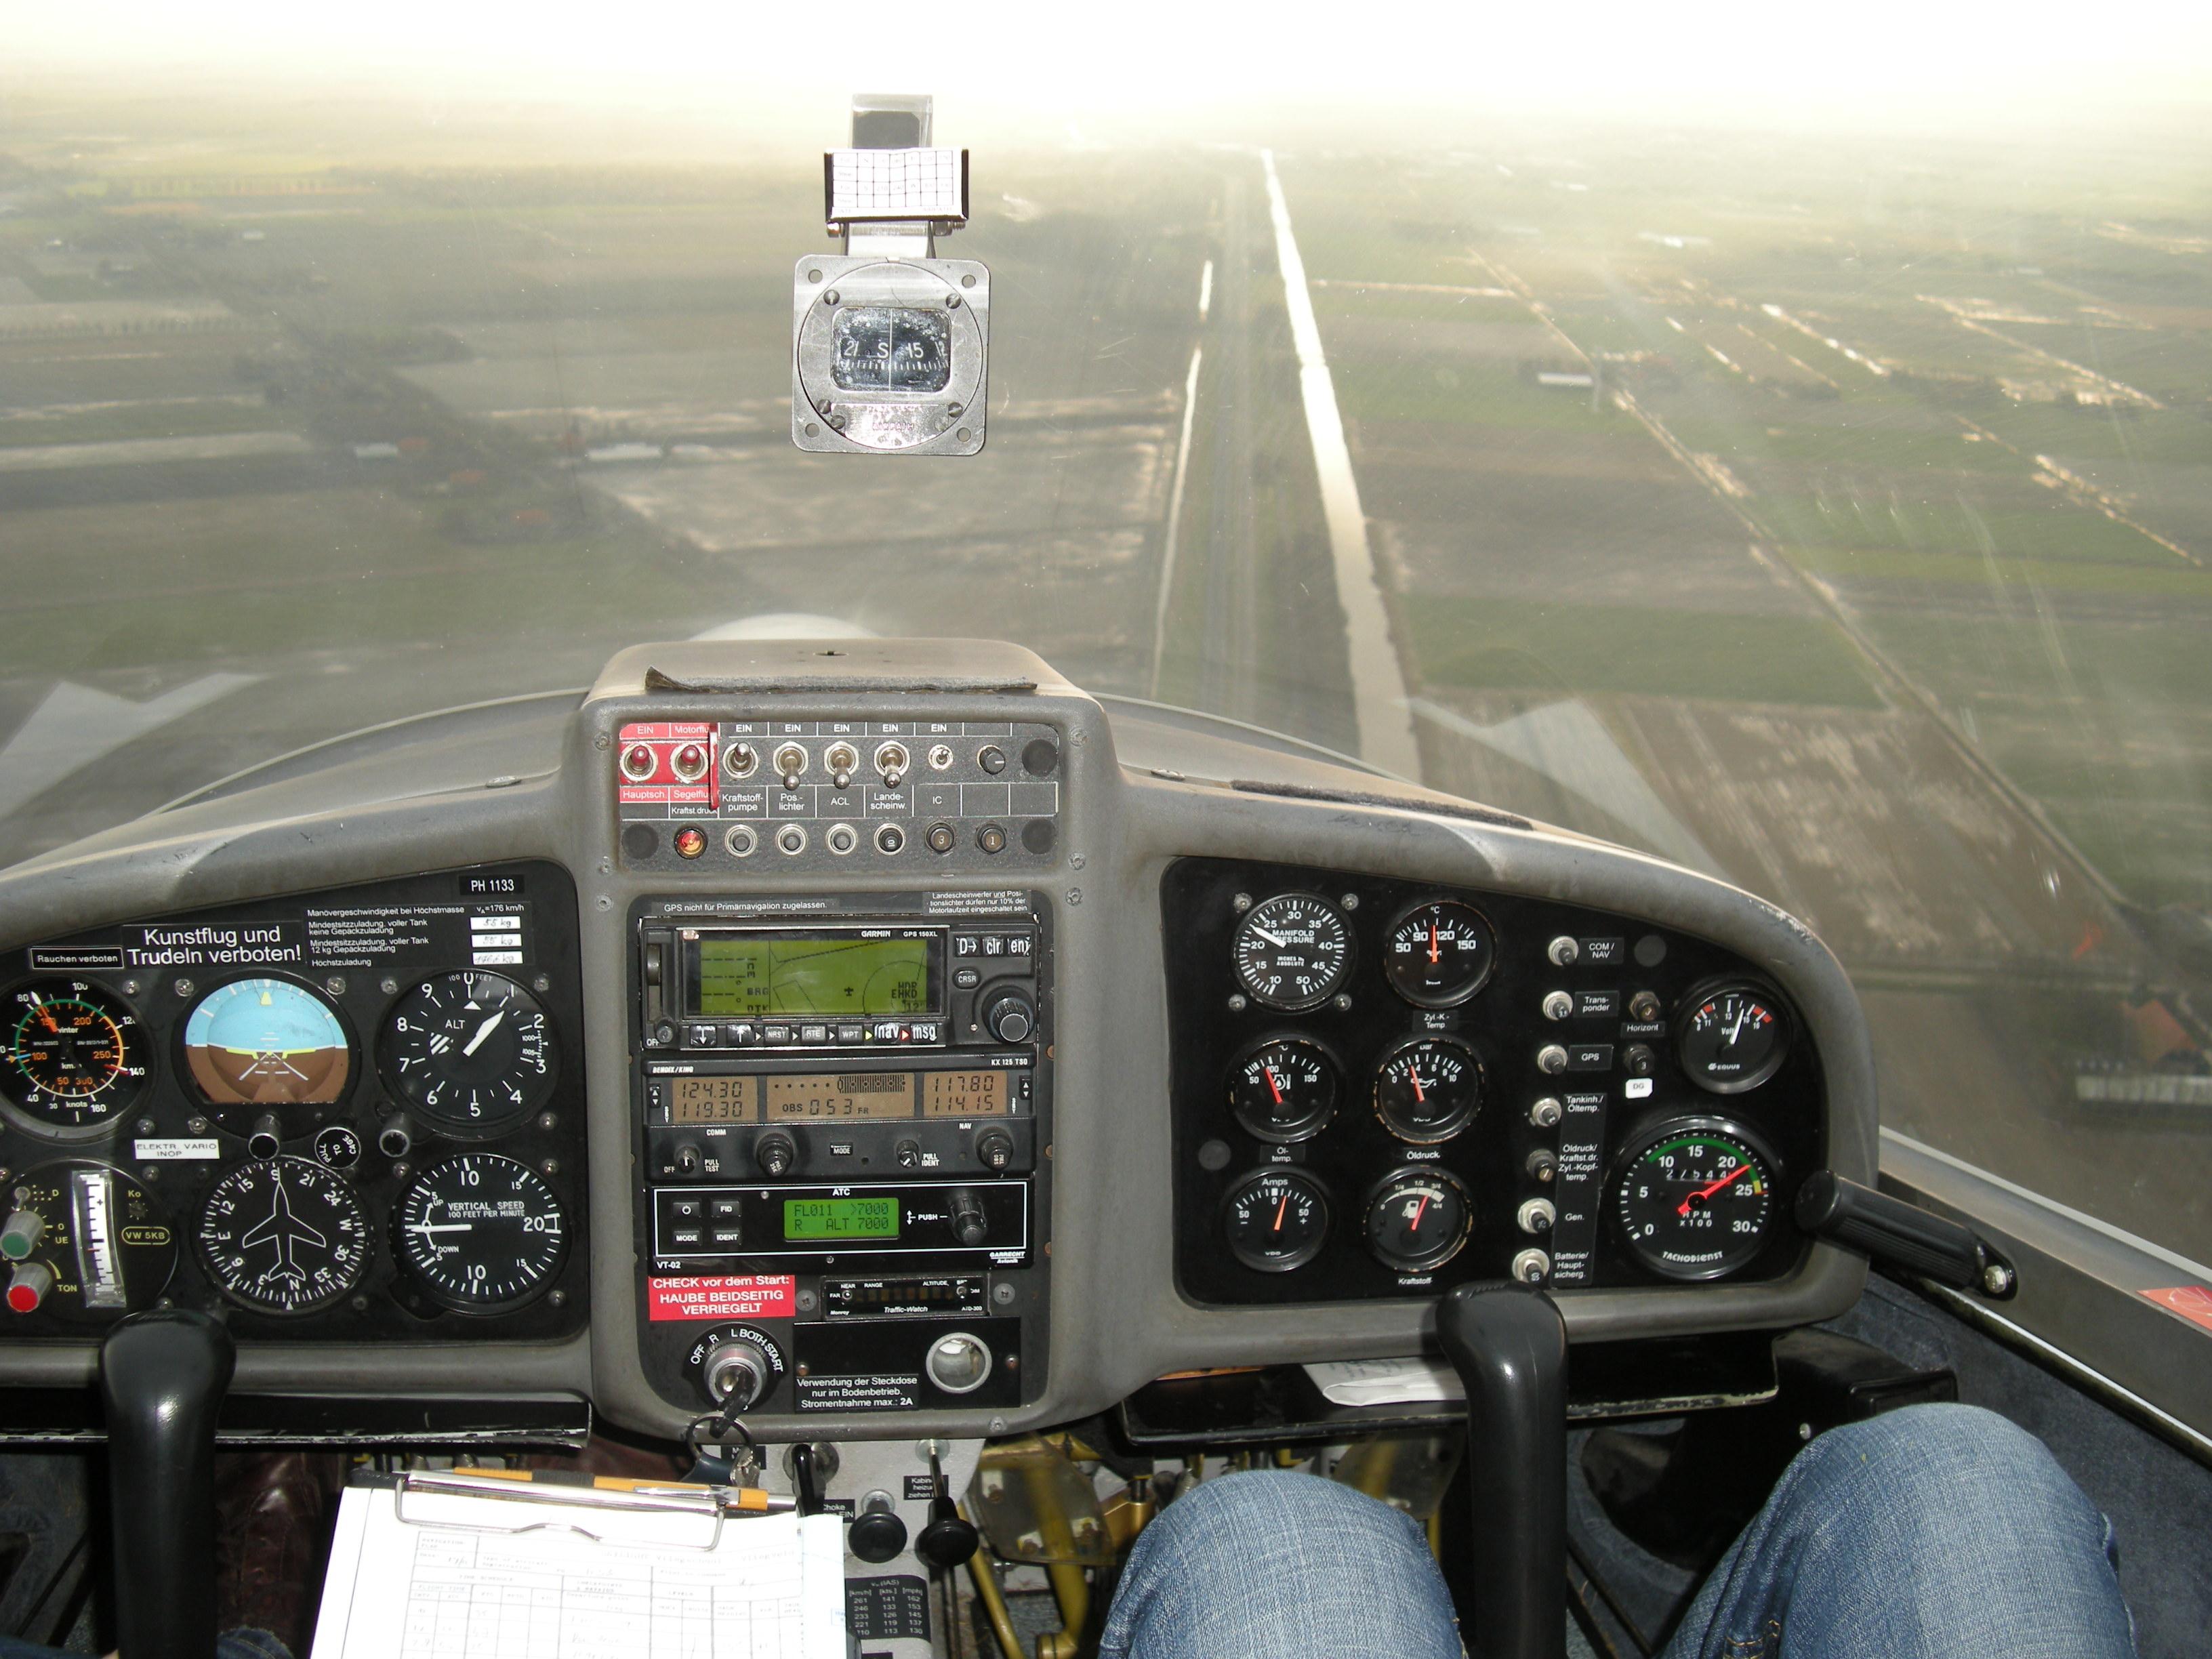 Overhead North Holand